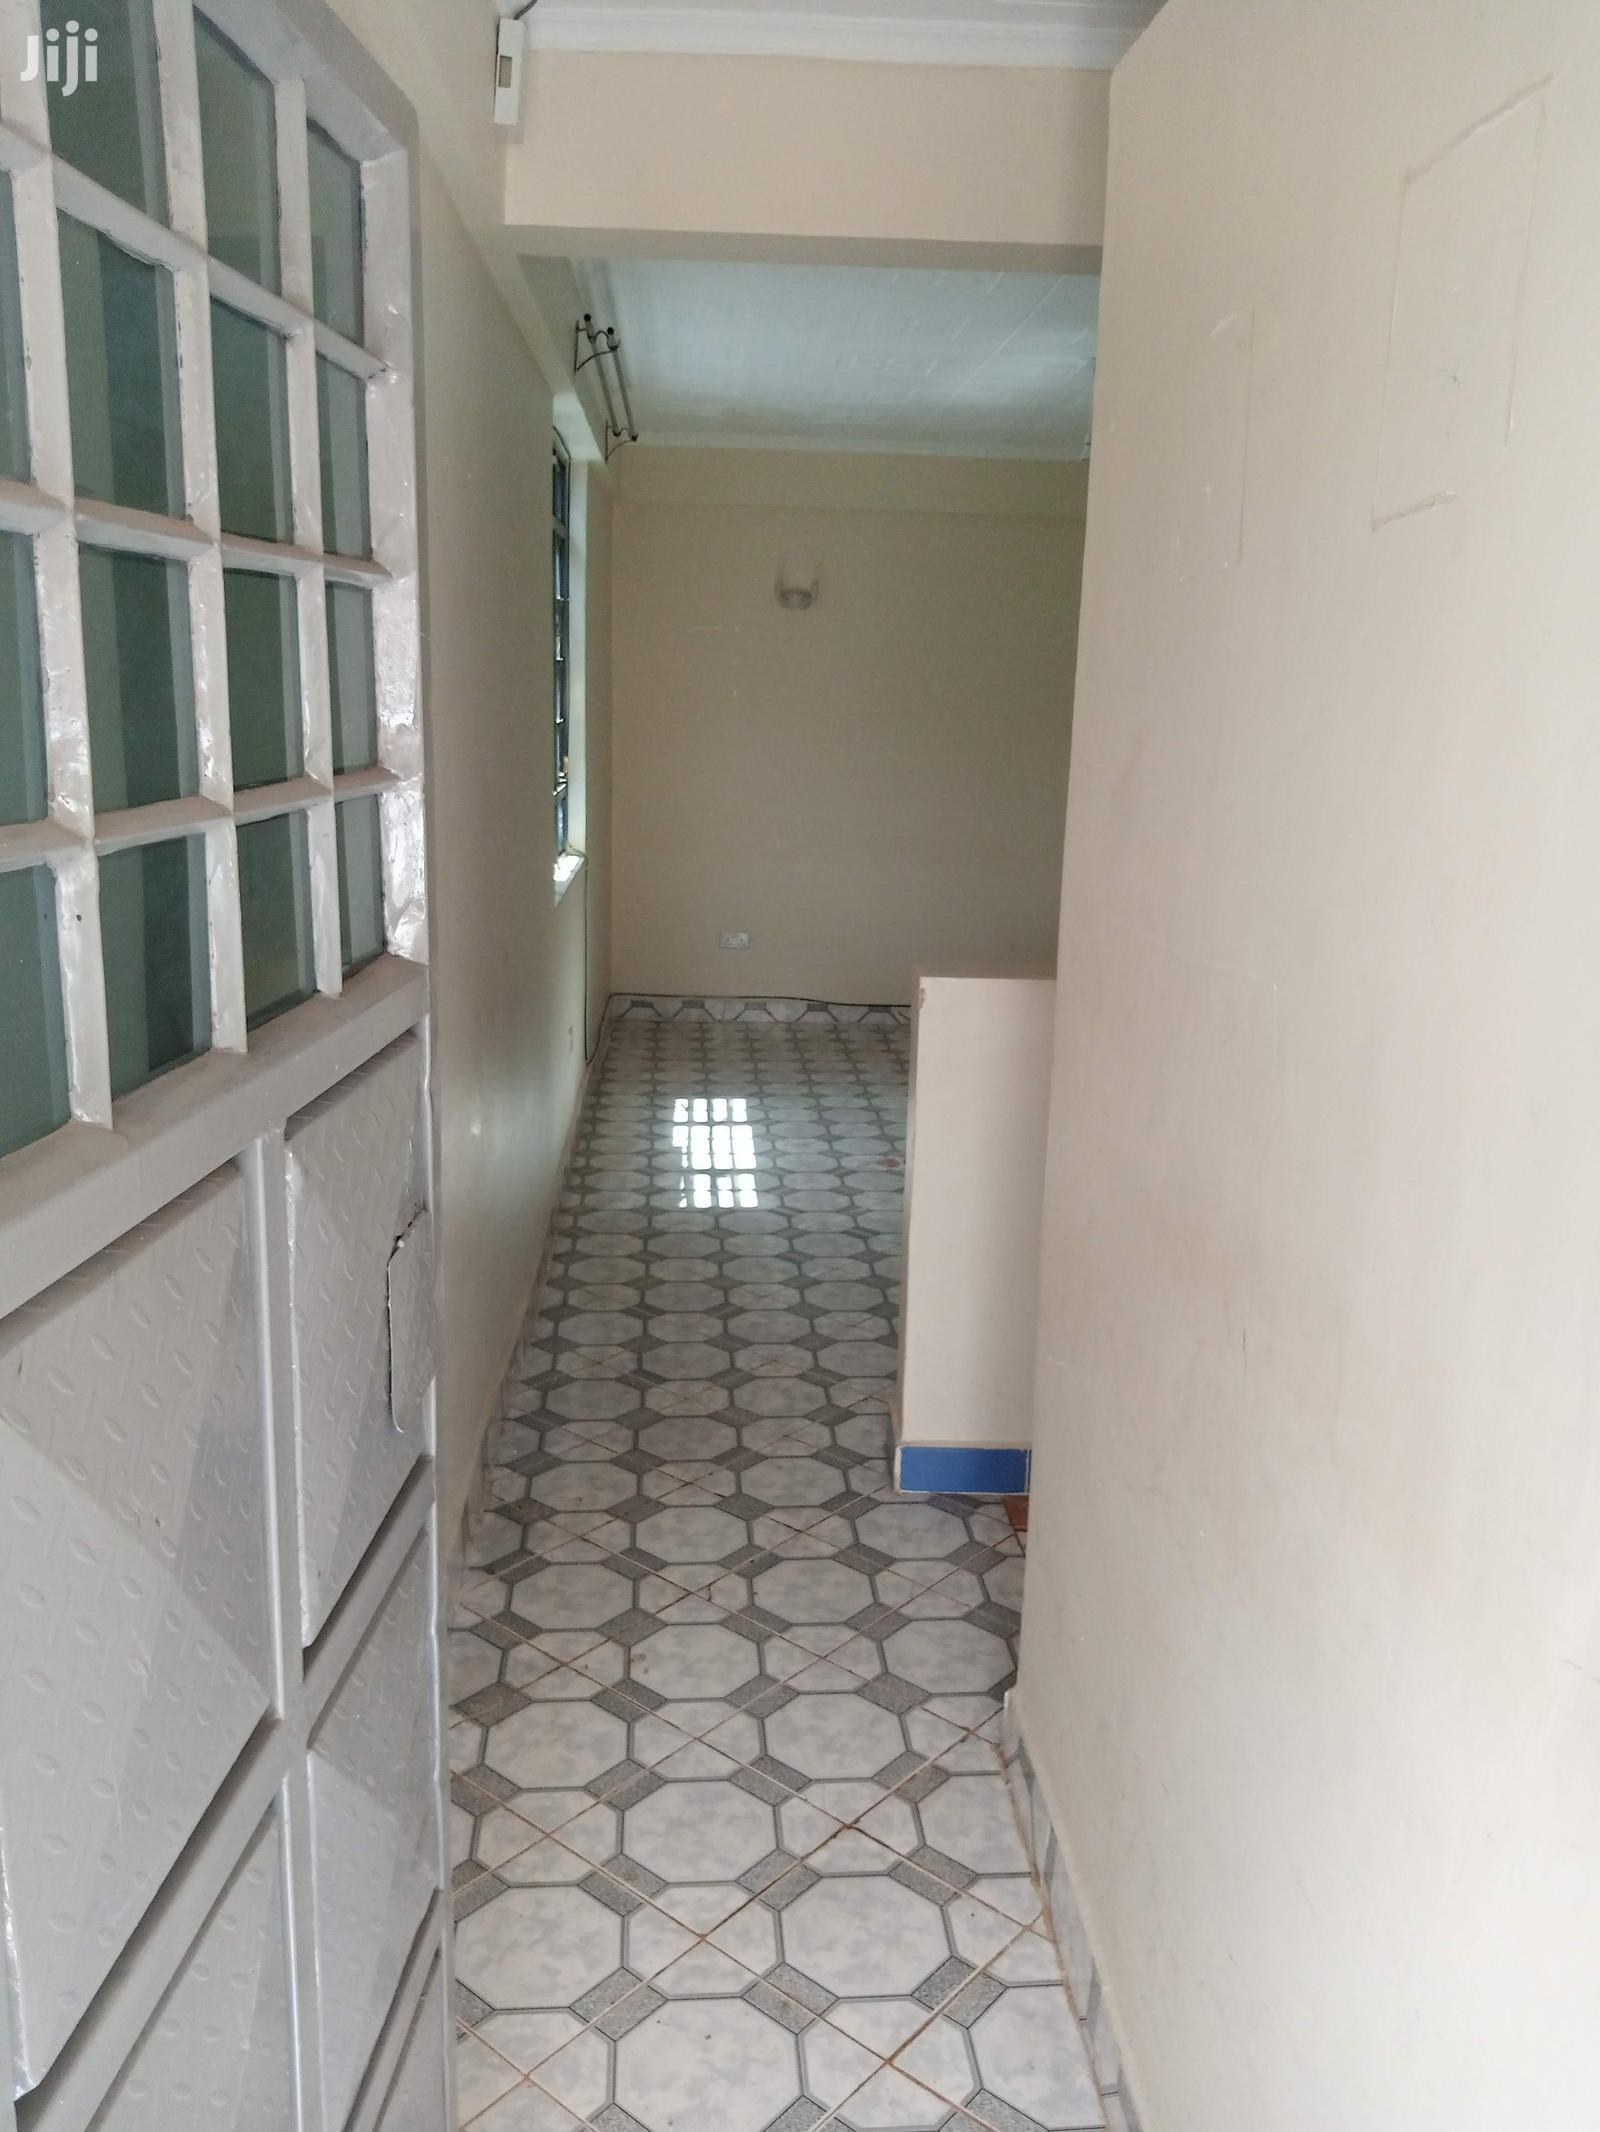 2 Bedroom Master Ensuite For Rent In Karen   Houses & Apartments For Rent for sale in Karen, Nairobi, Kenya